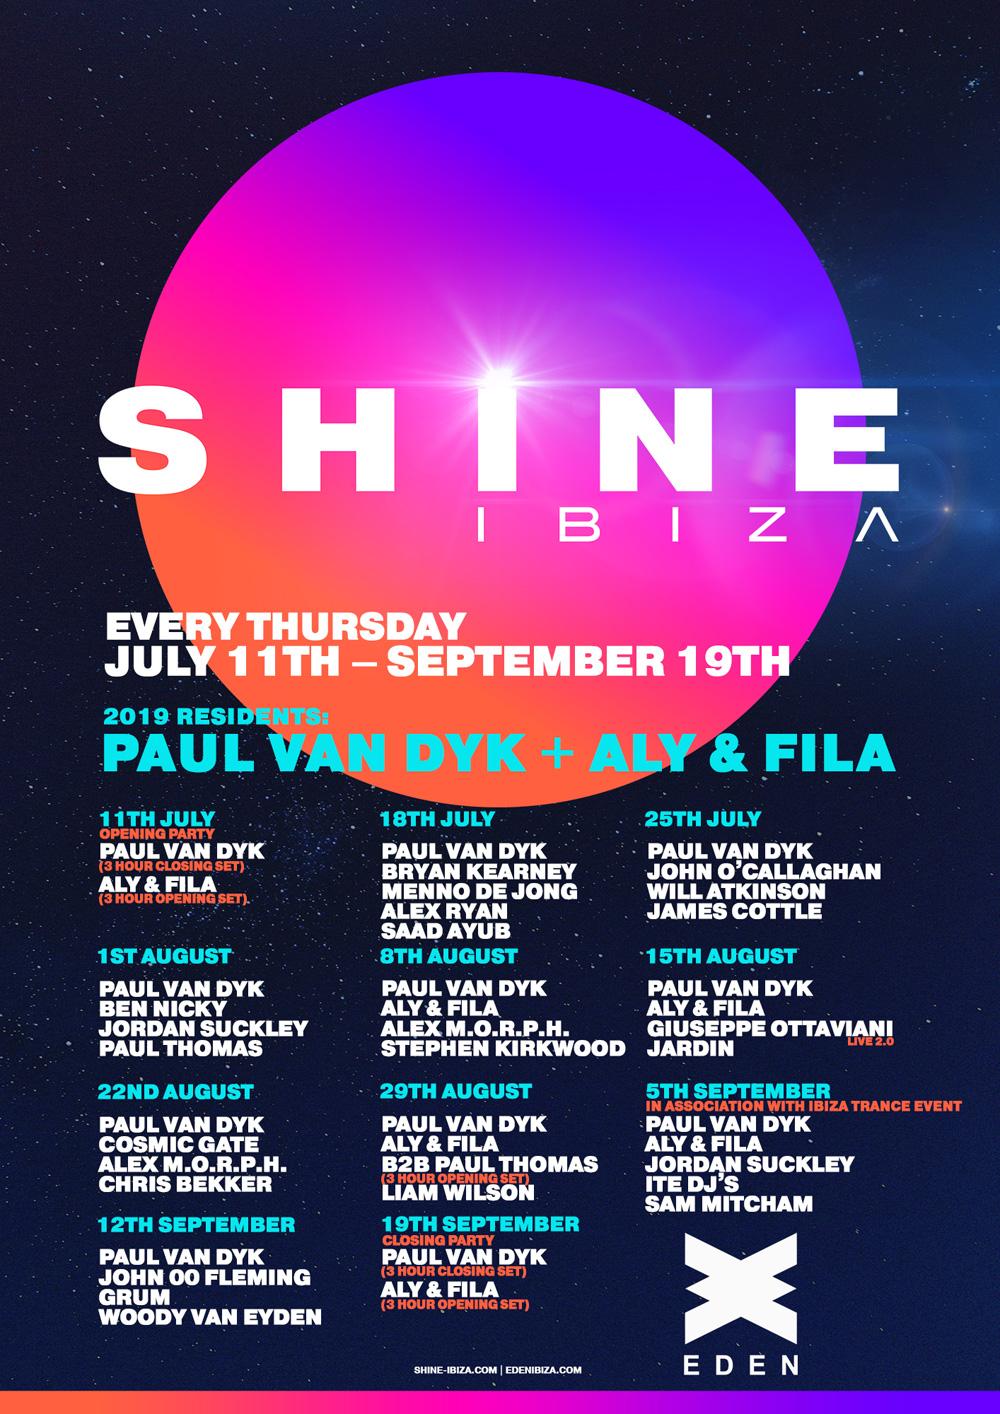 SHINE Ibiza Reveals Season 2019 Dates & Line Up